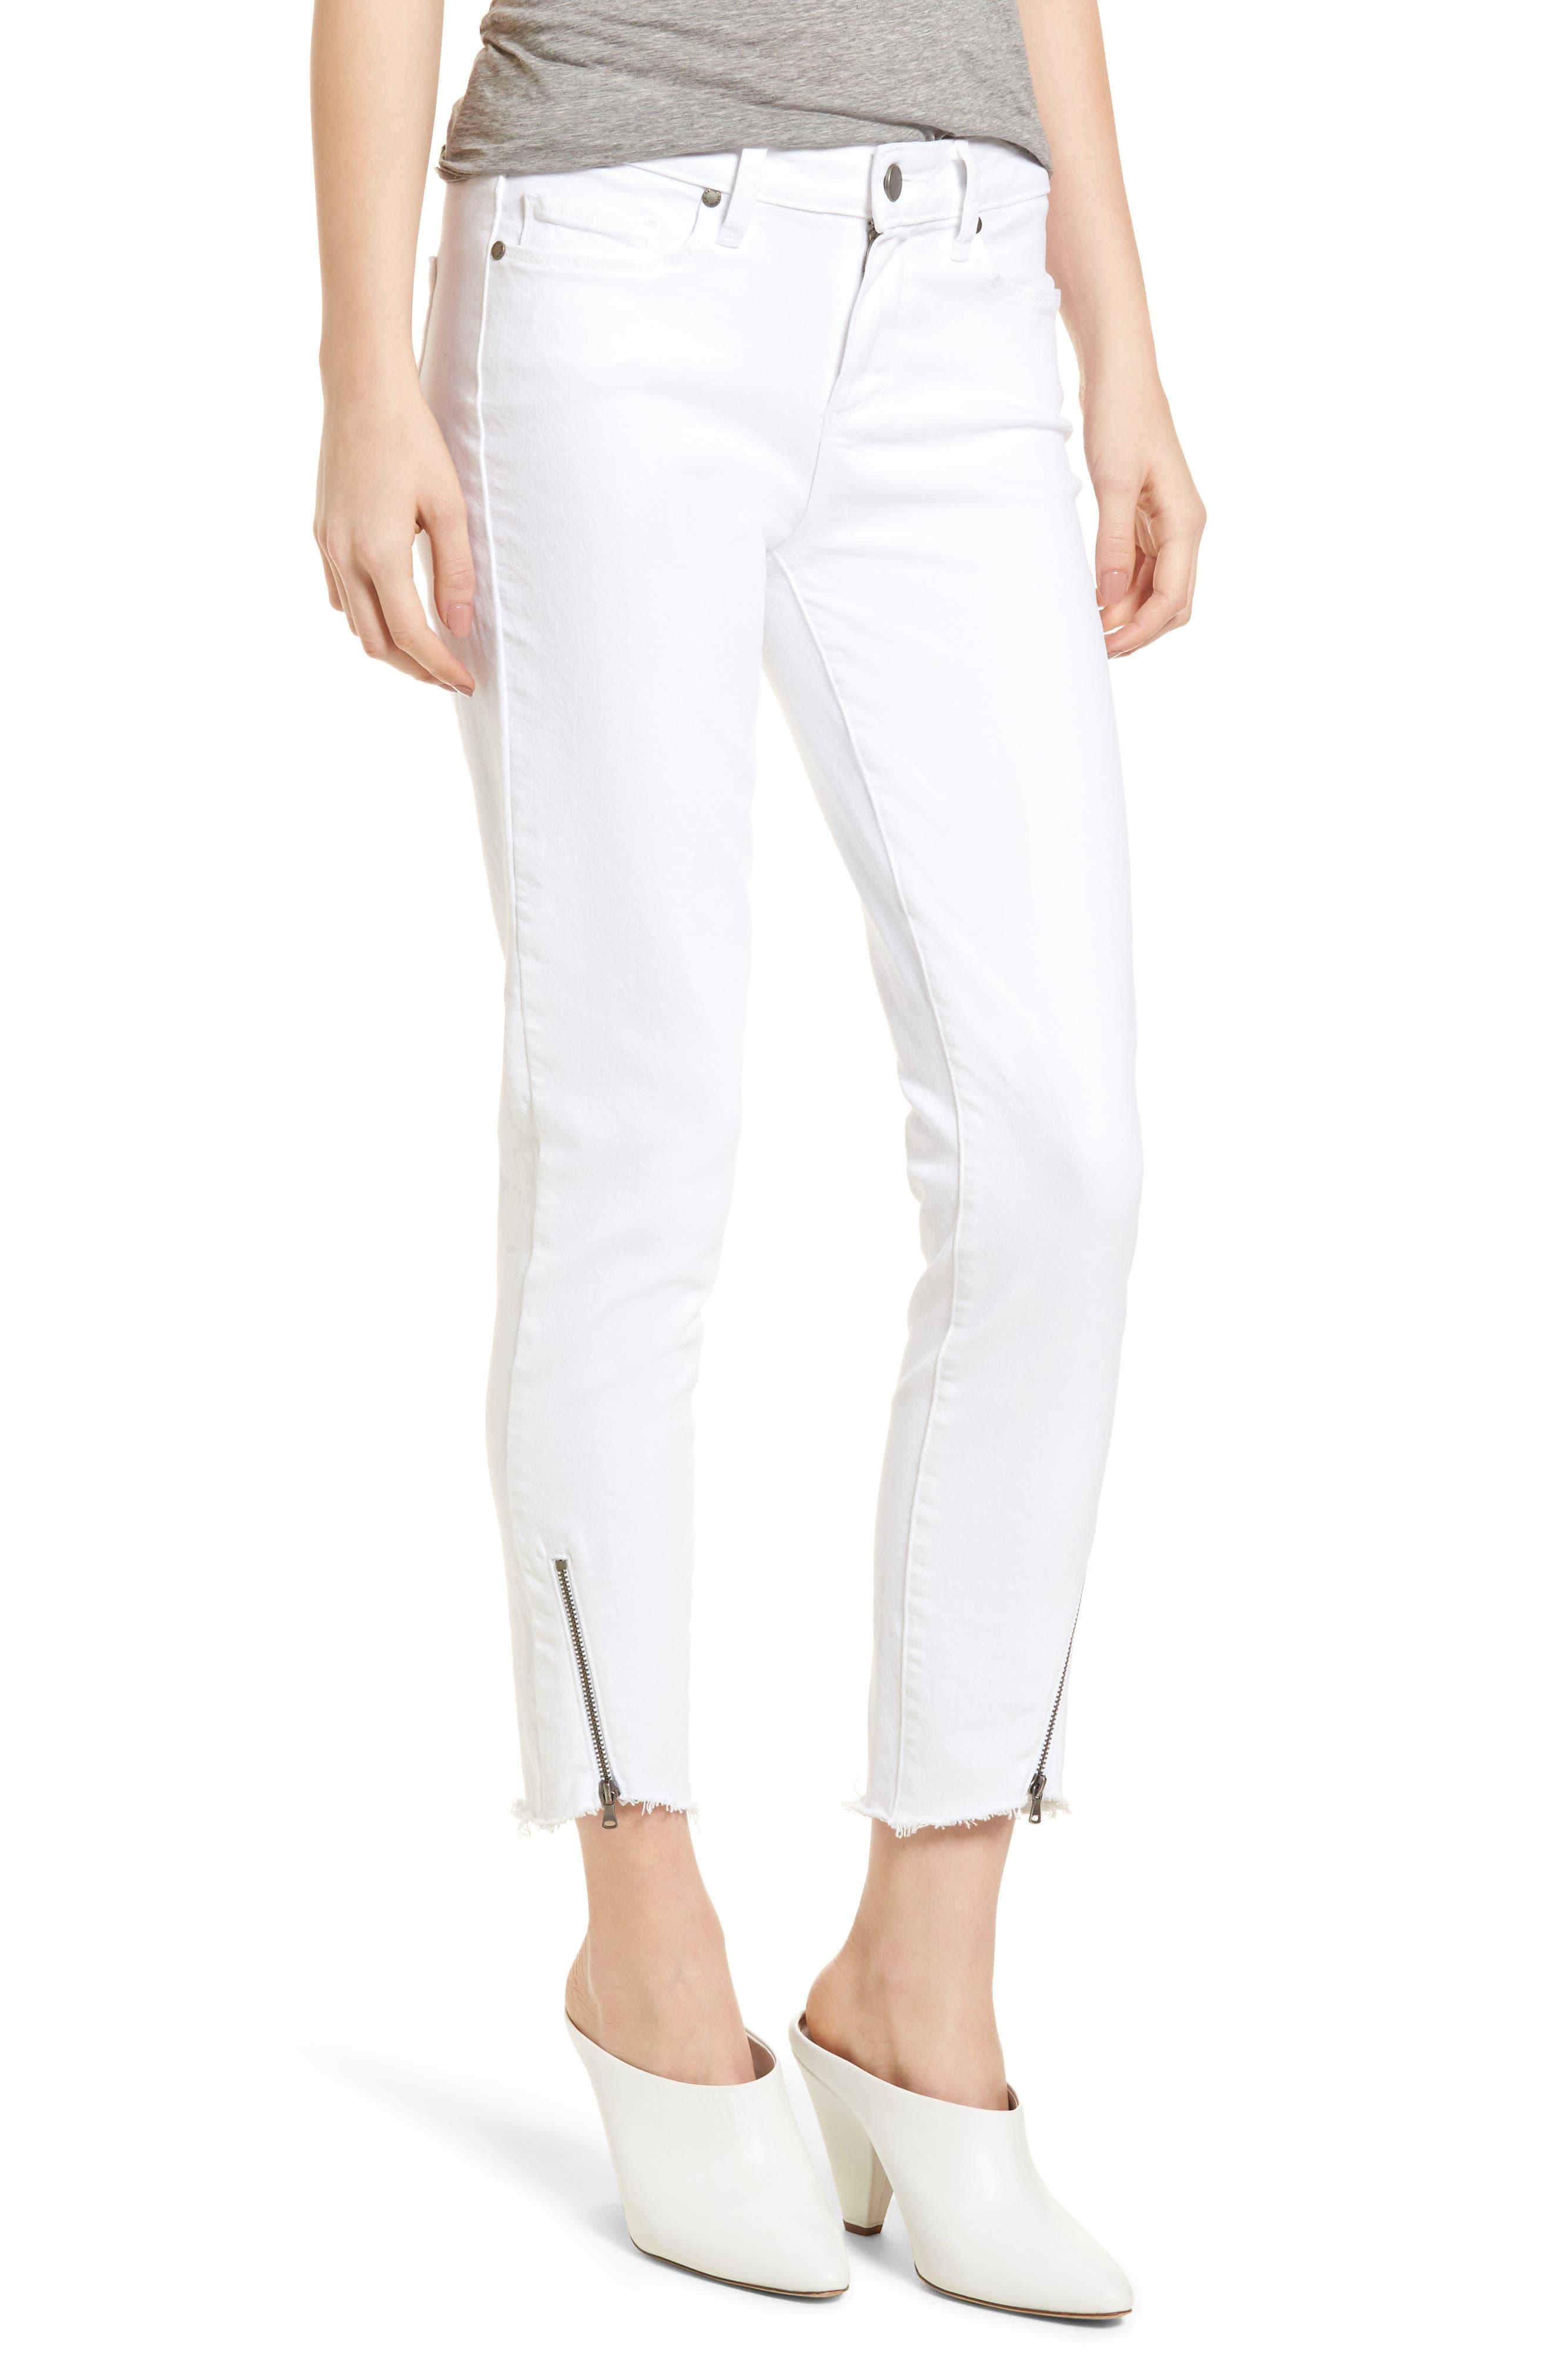 Verdugo Crop Ultra Skinny Jeans,                             Main thumbnail 1, color,                             Crisp White